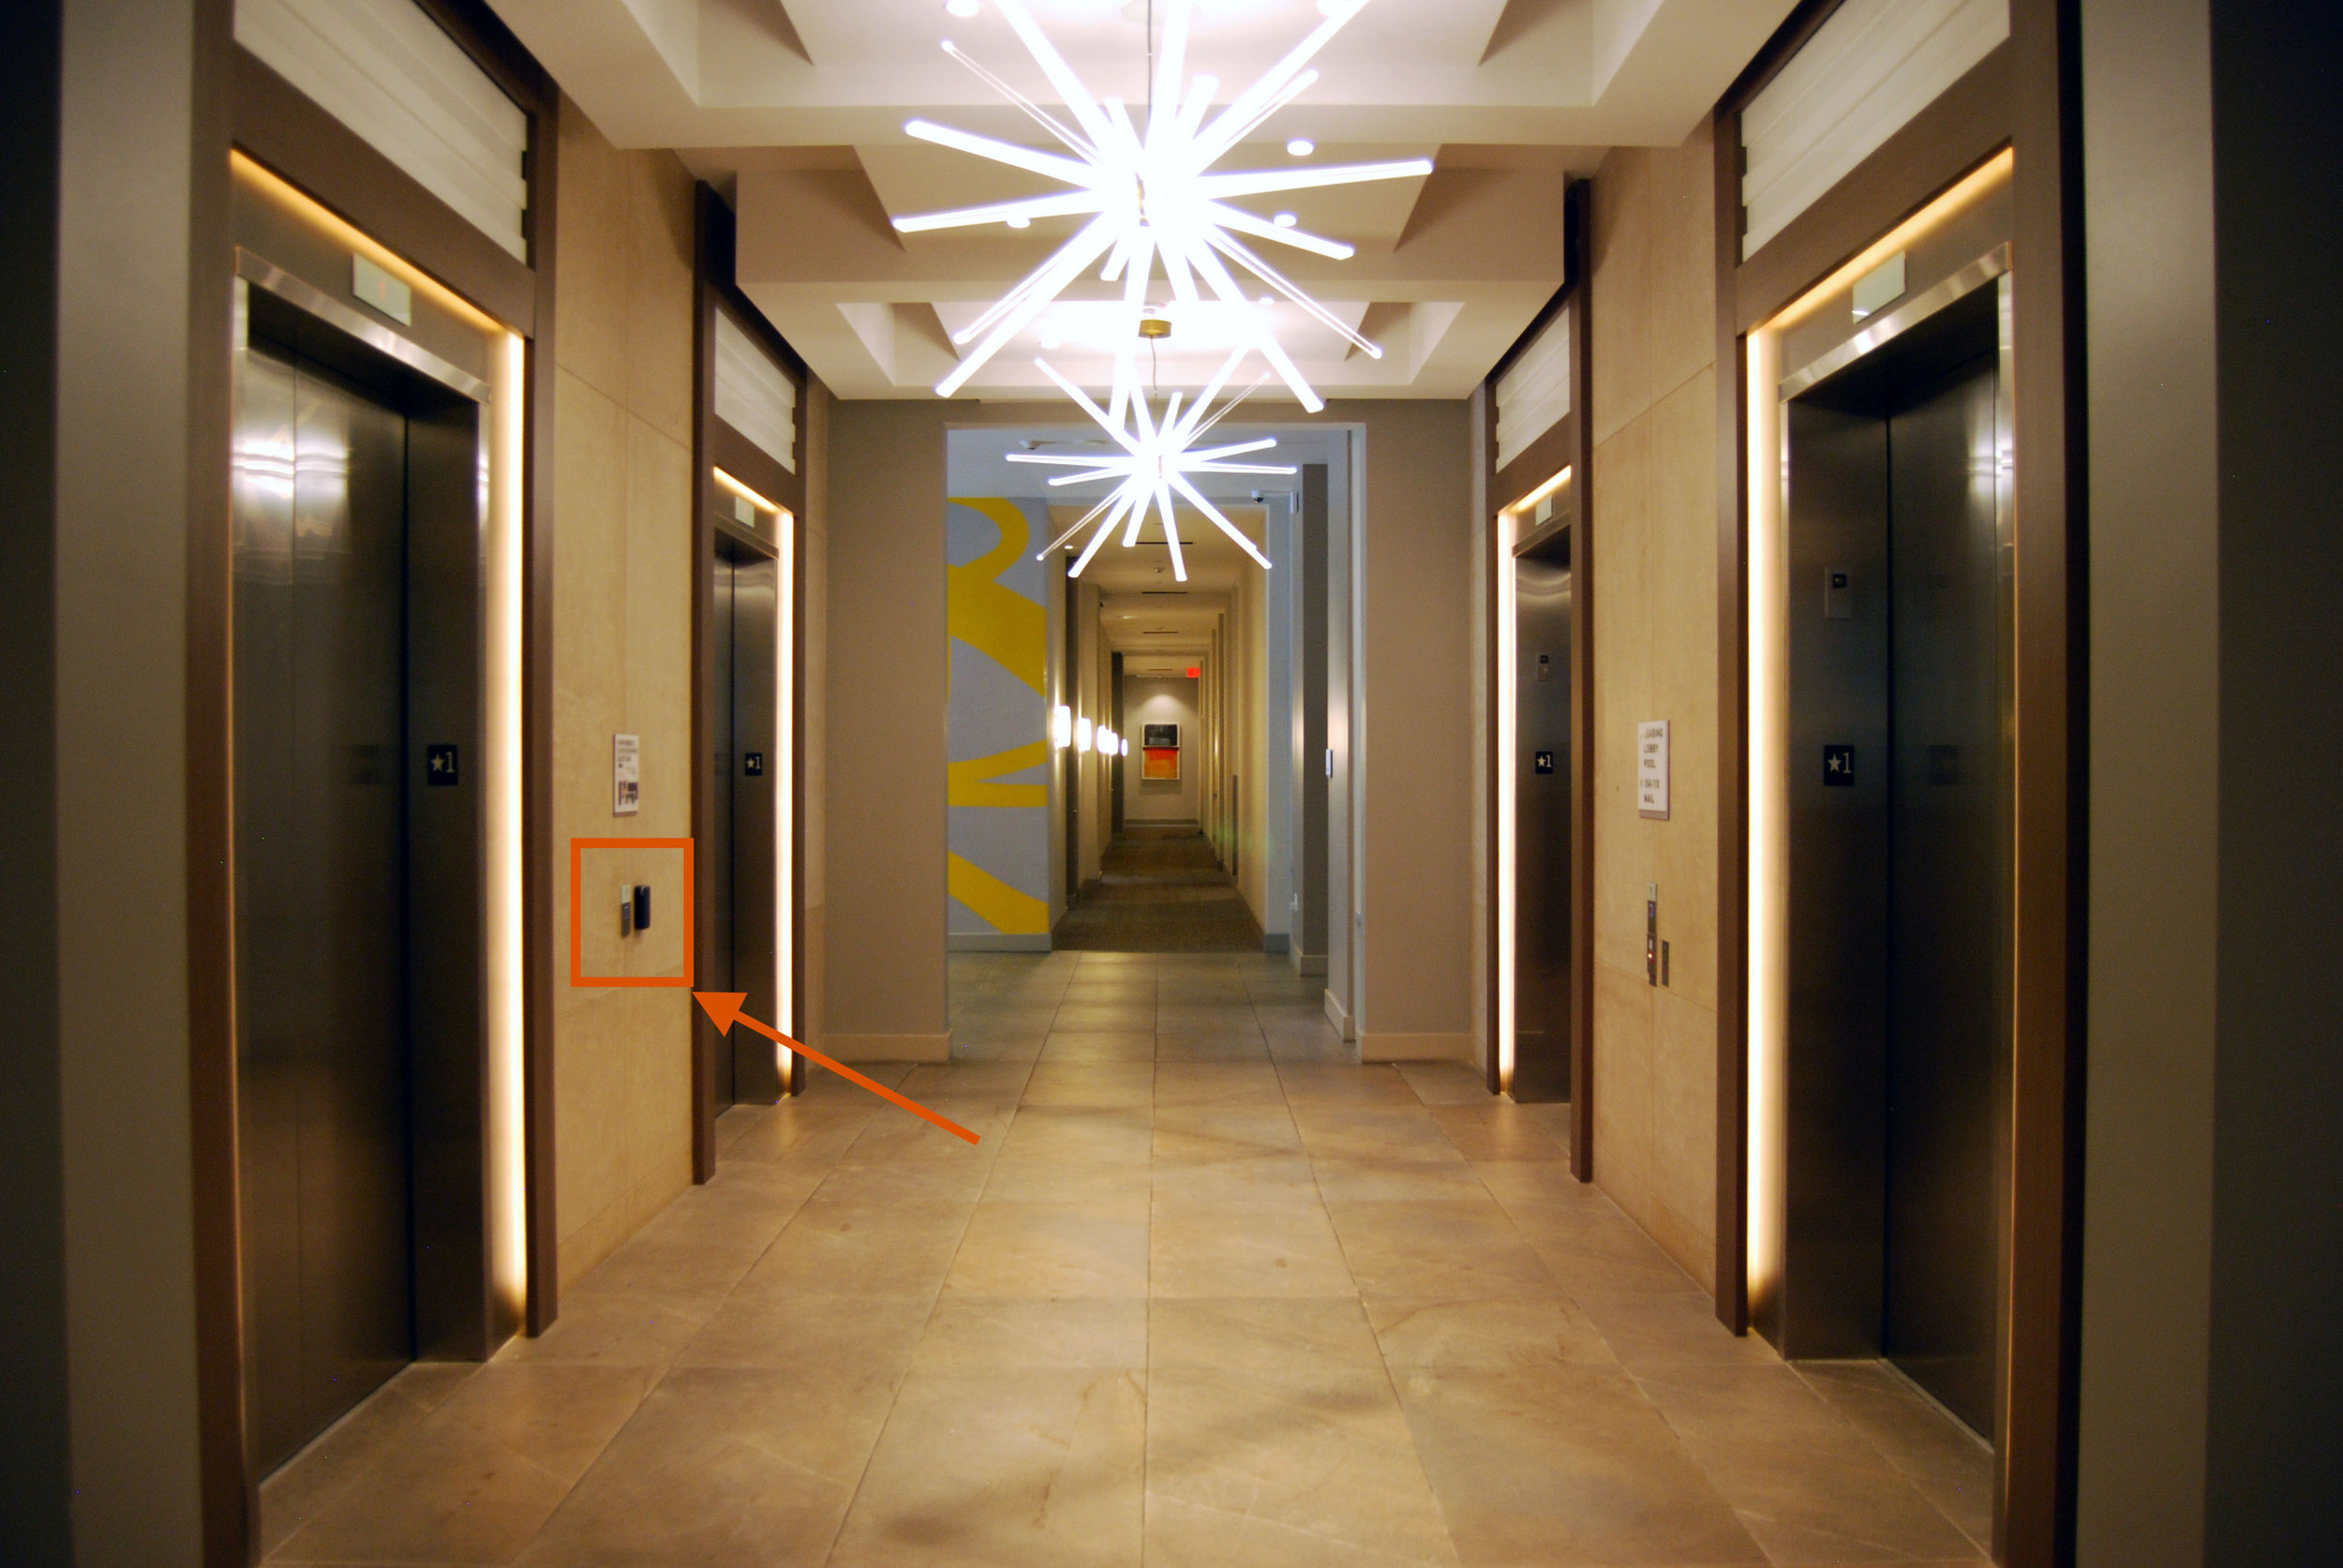 Elevators 001 copy.JPG